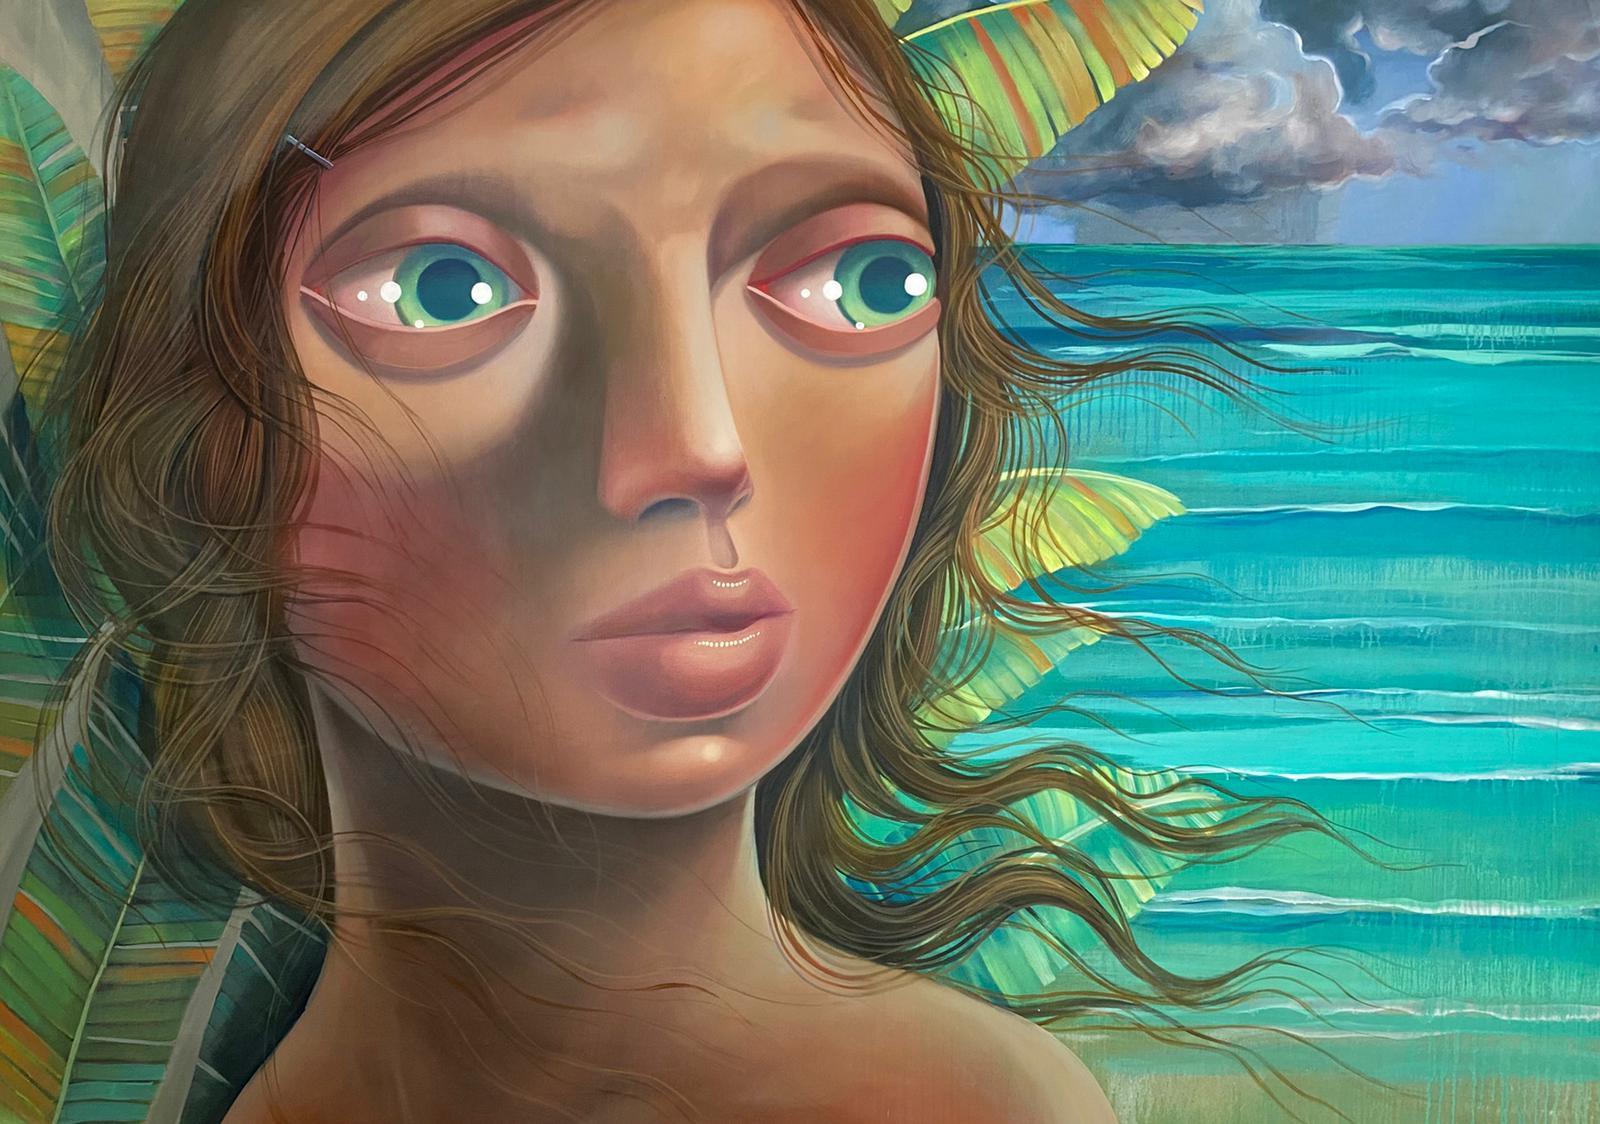 A Great Escape by Tania Marmolejo